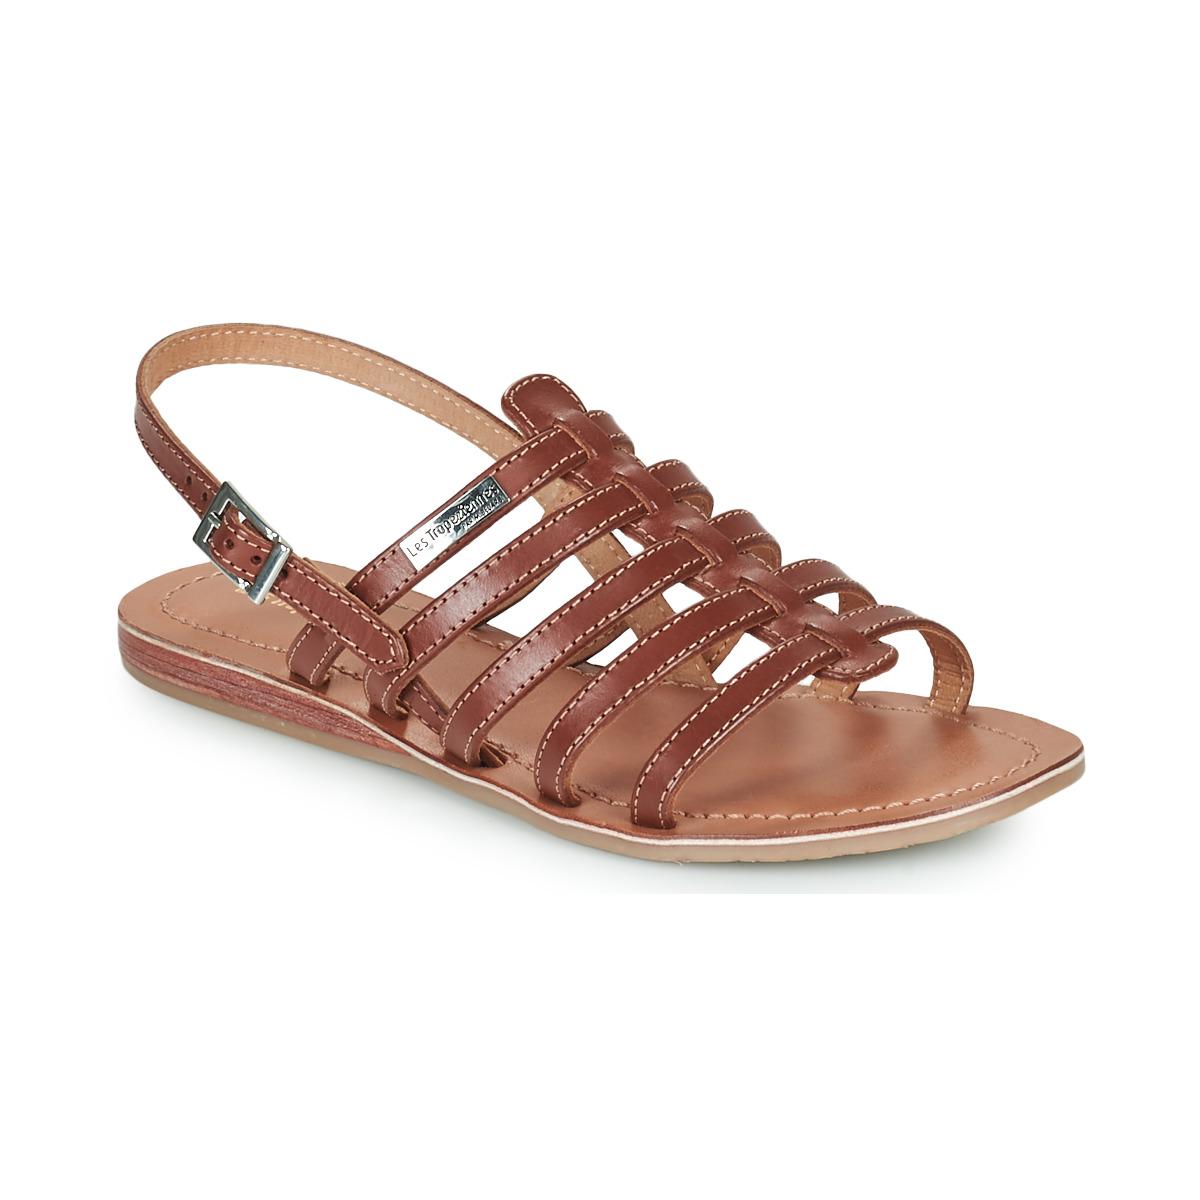 sandales femme marron b8b538989d0